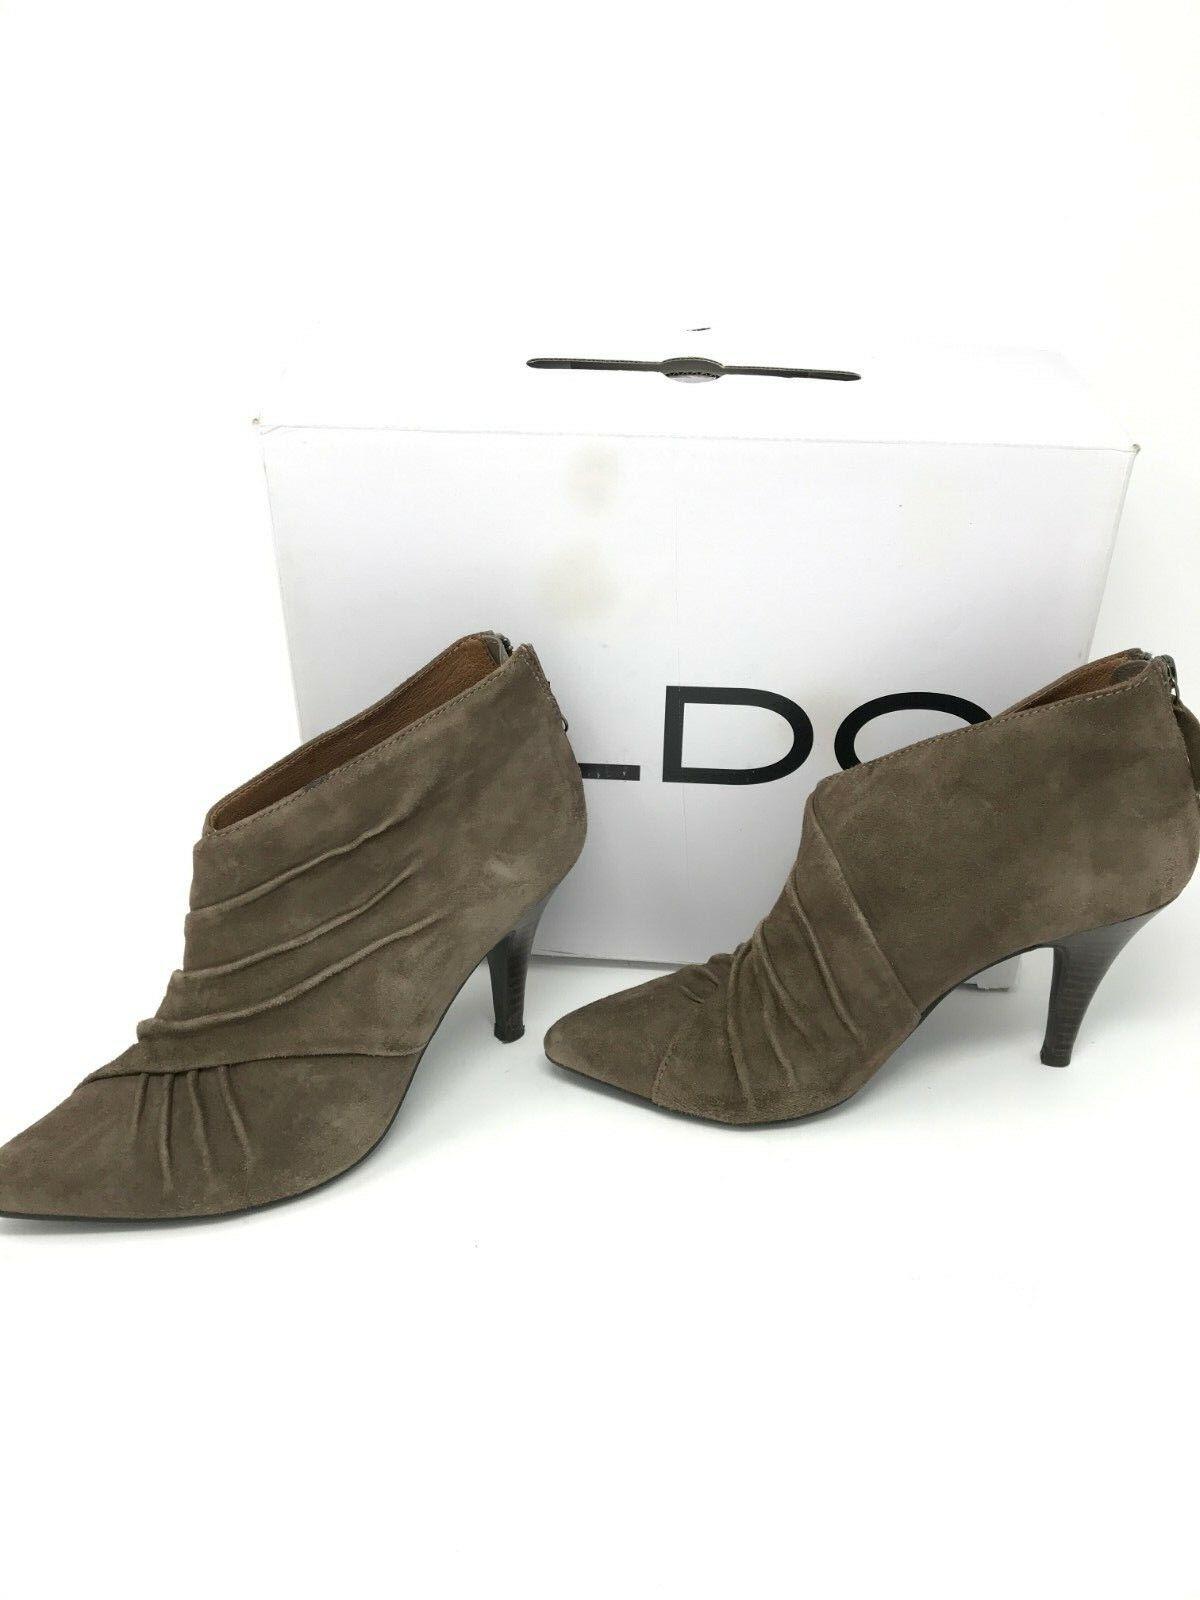 Aldo Women's Camilo Suede Ankle Booties Tan SZ 8 Pointed Zipper EUC Box included